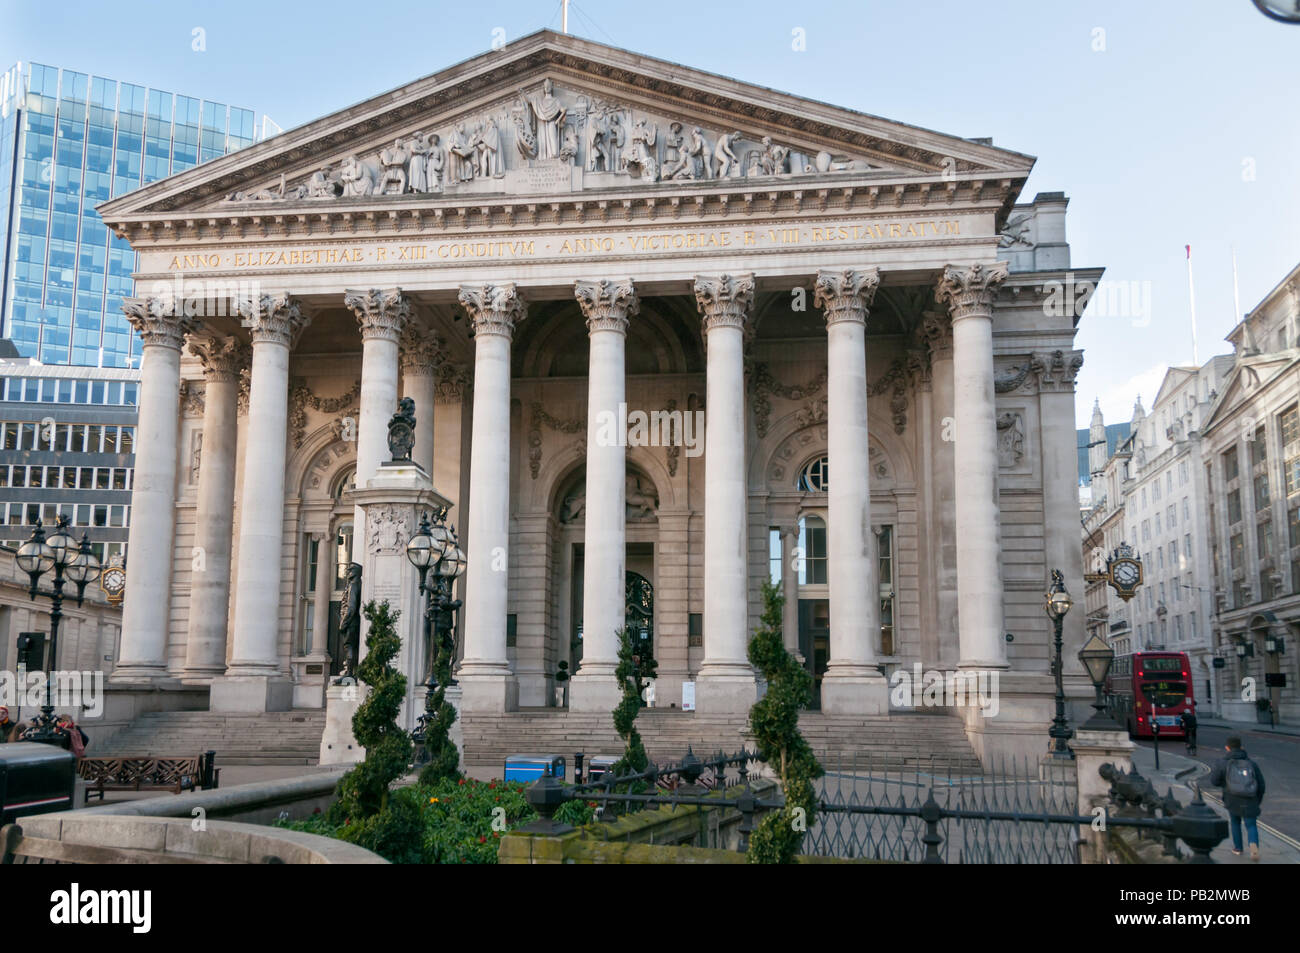 The Royal Exchange, London, United Kingdom - Stock Image